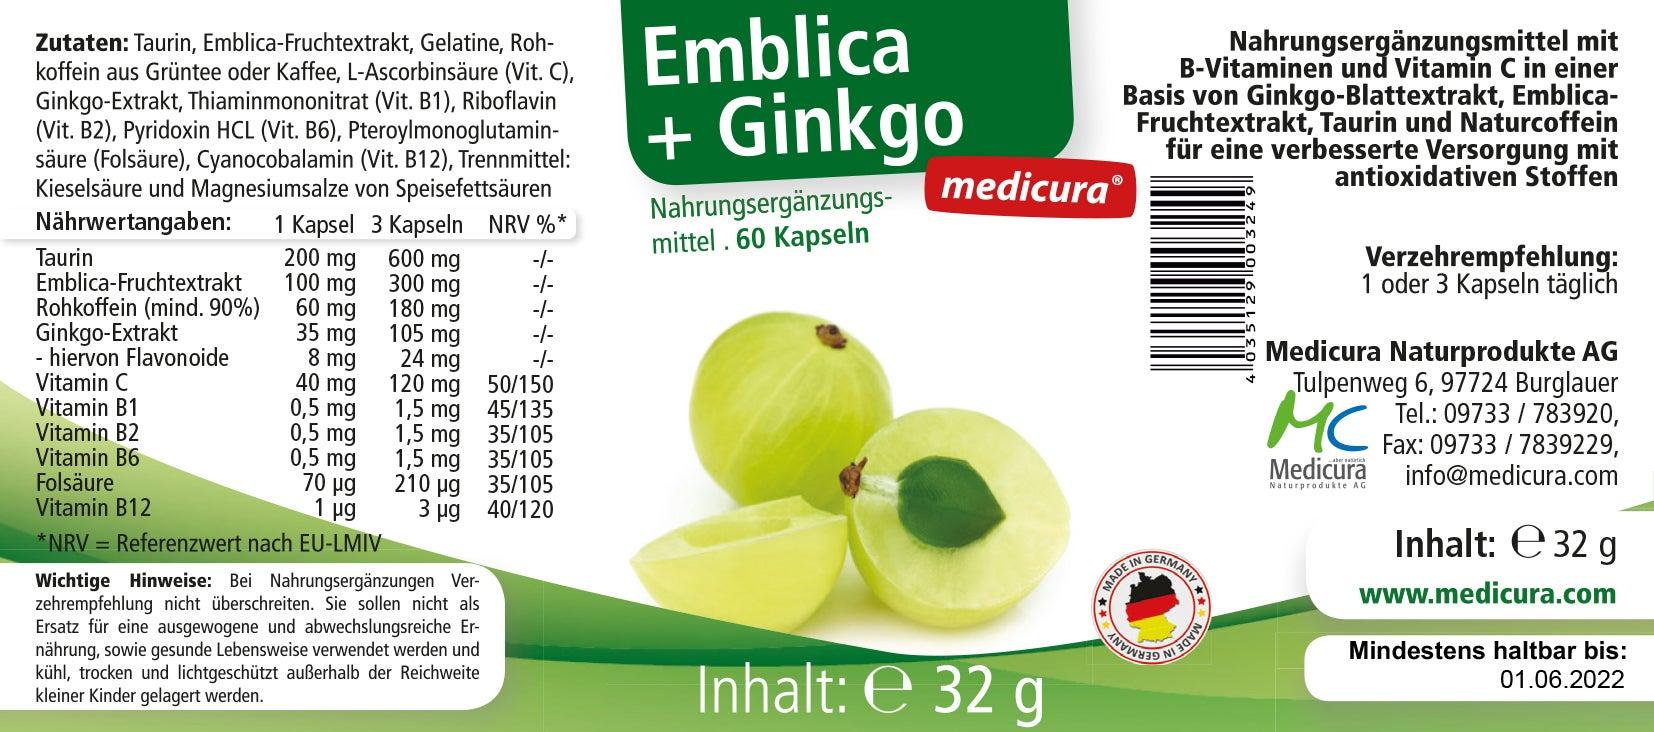 Emblica + Ginkgo